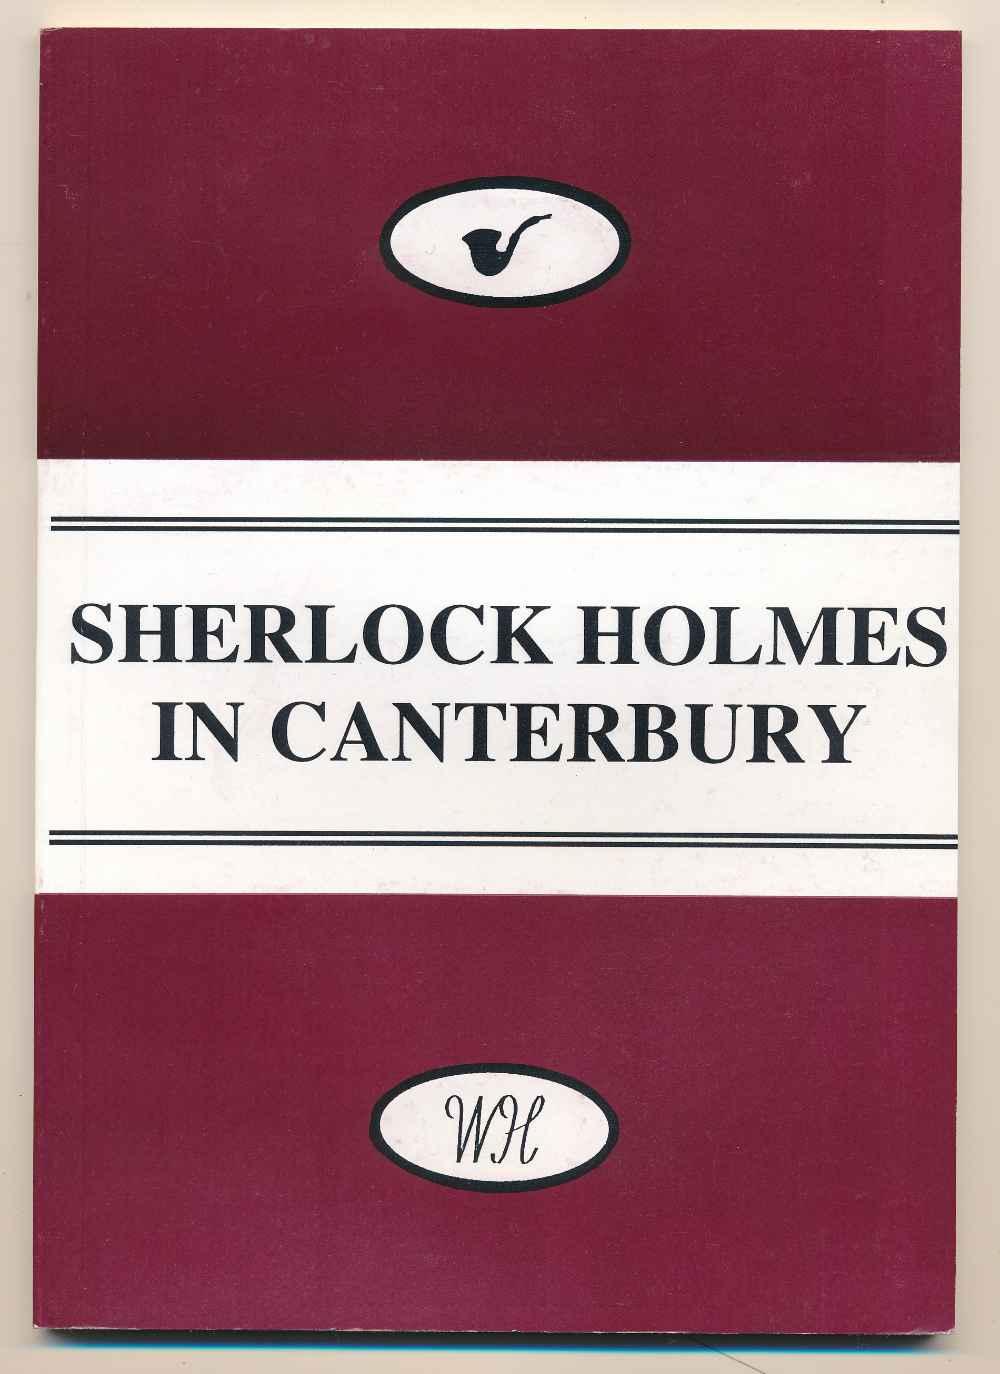 Sherlock Holmes in Canterbury